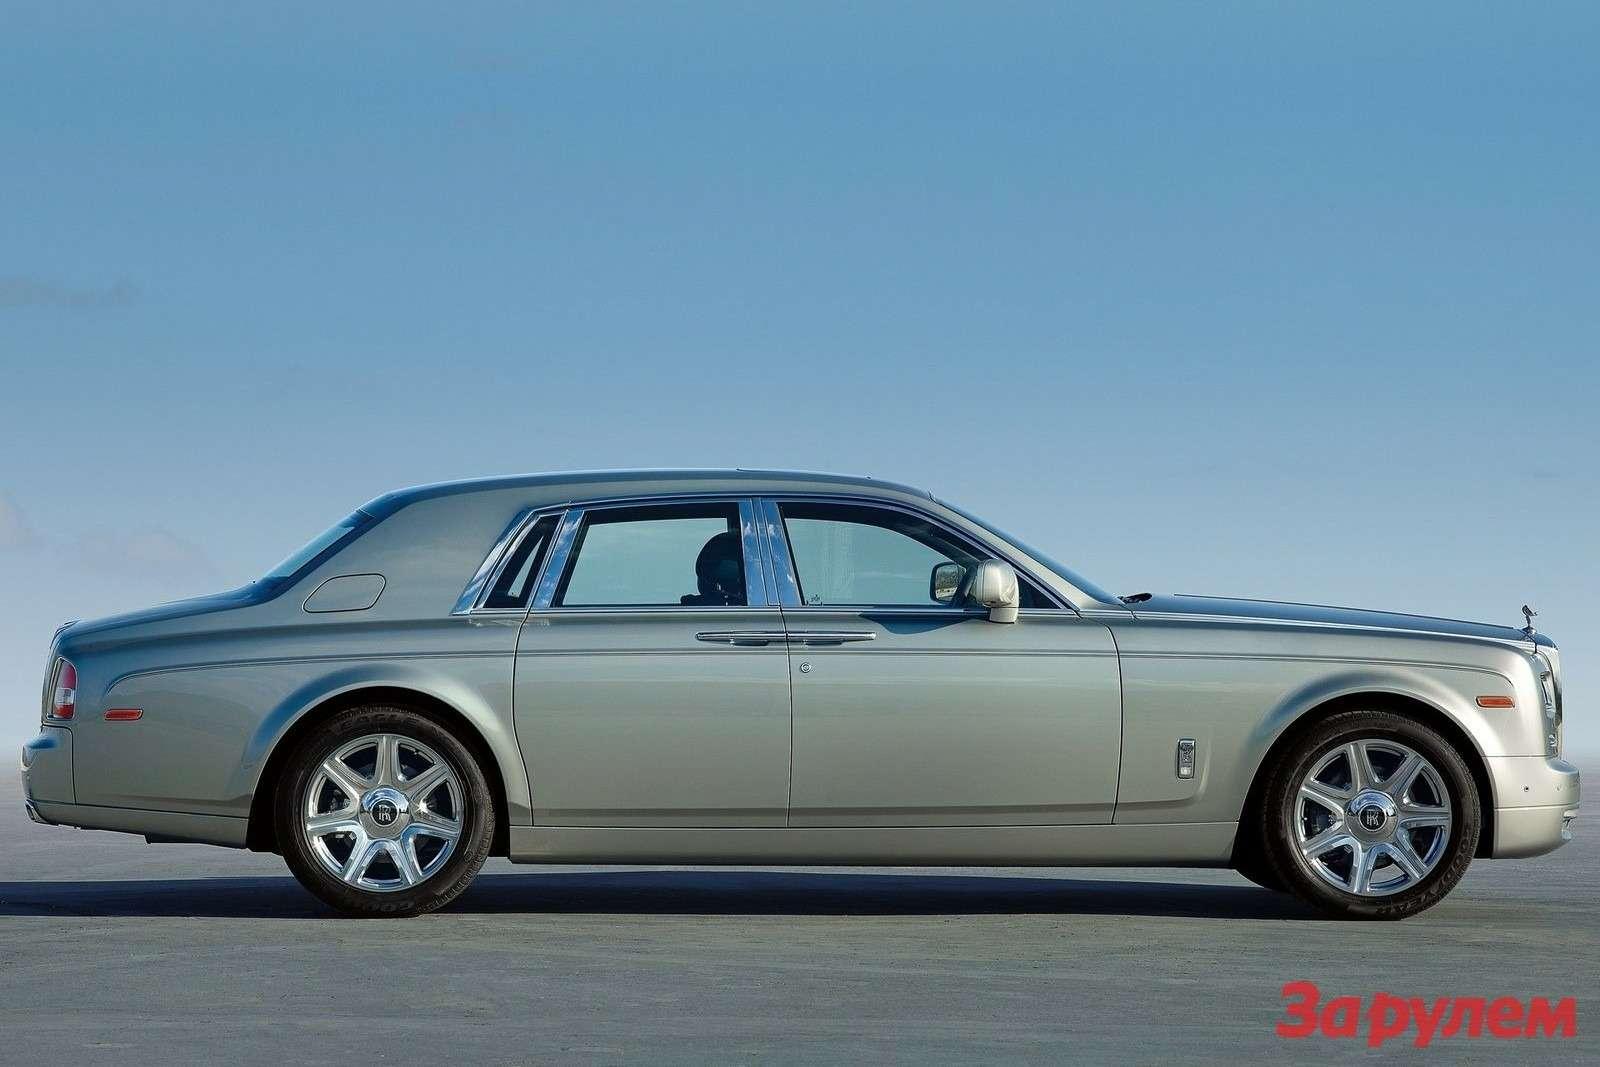 Rolls Royce Phantom 2013 1600x1200 wallpaper 0e